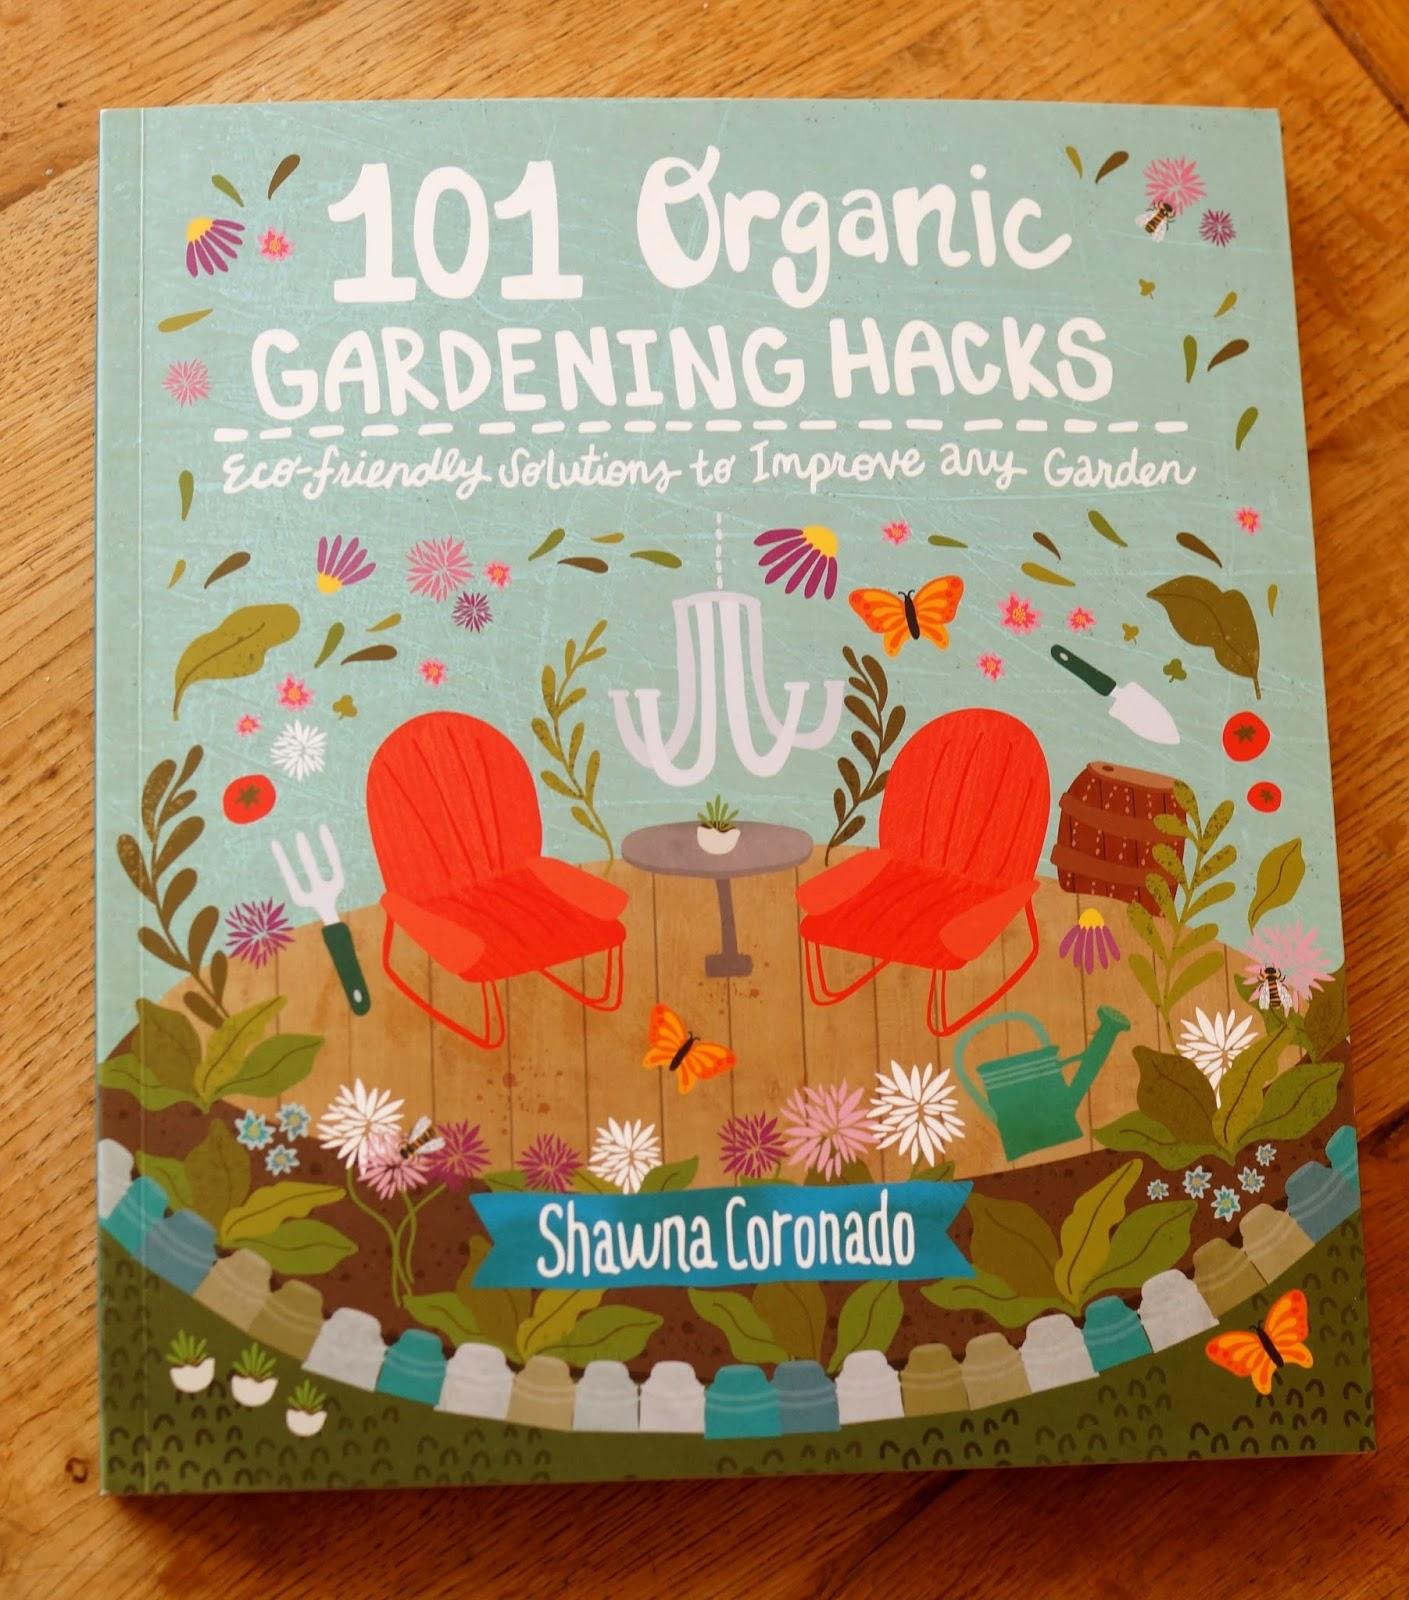 101 Organic Gardening Hacks - Book Review